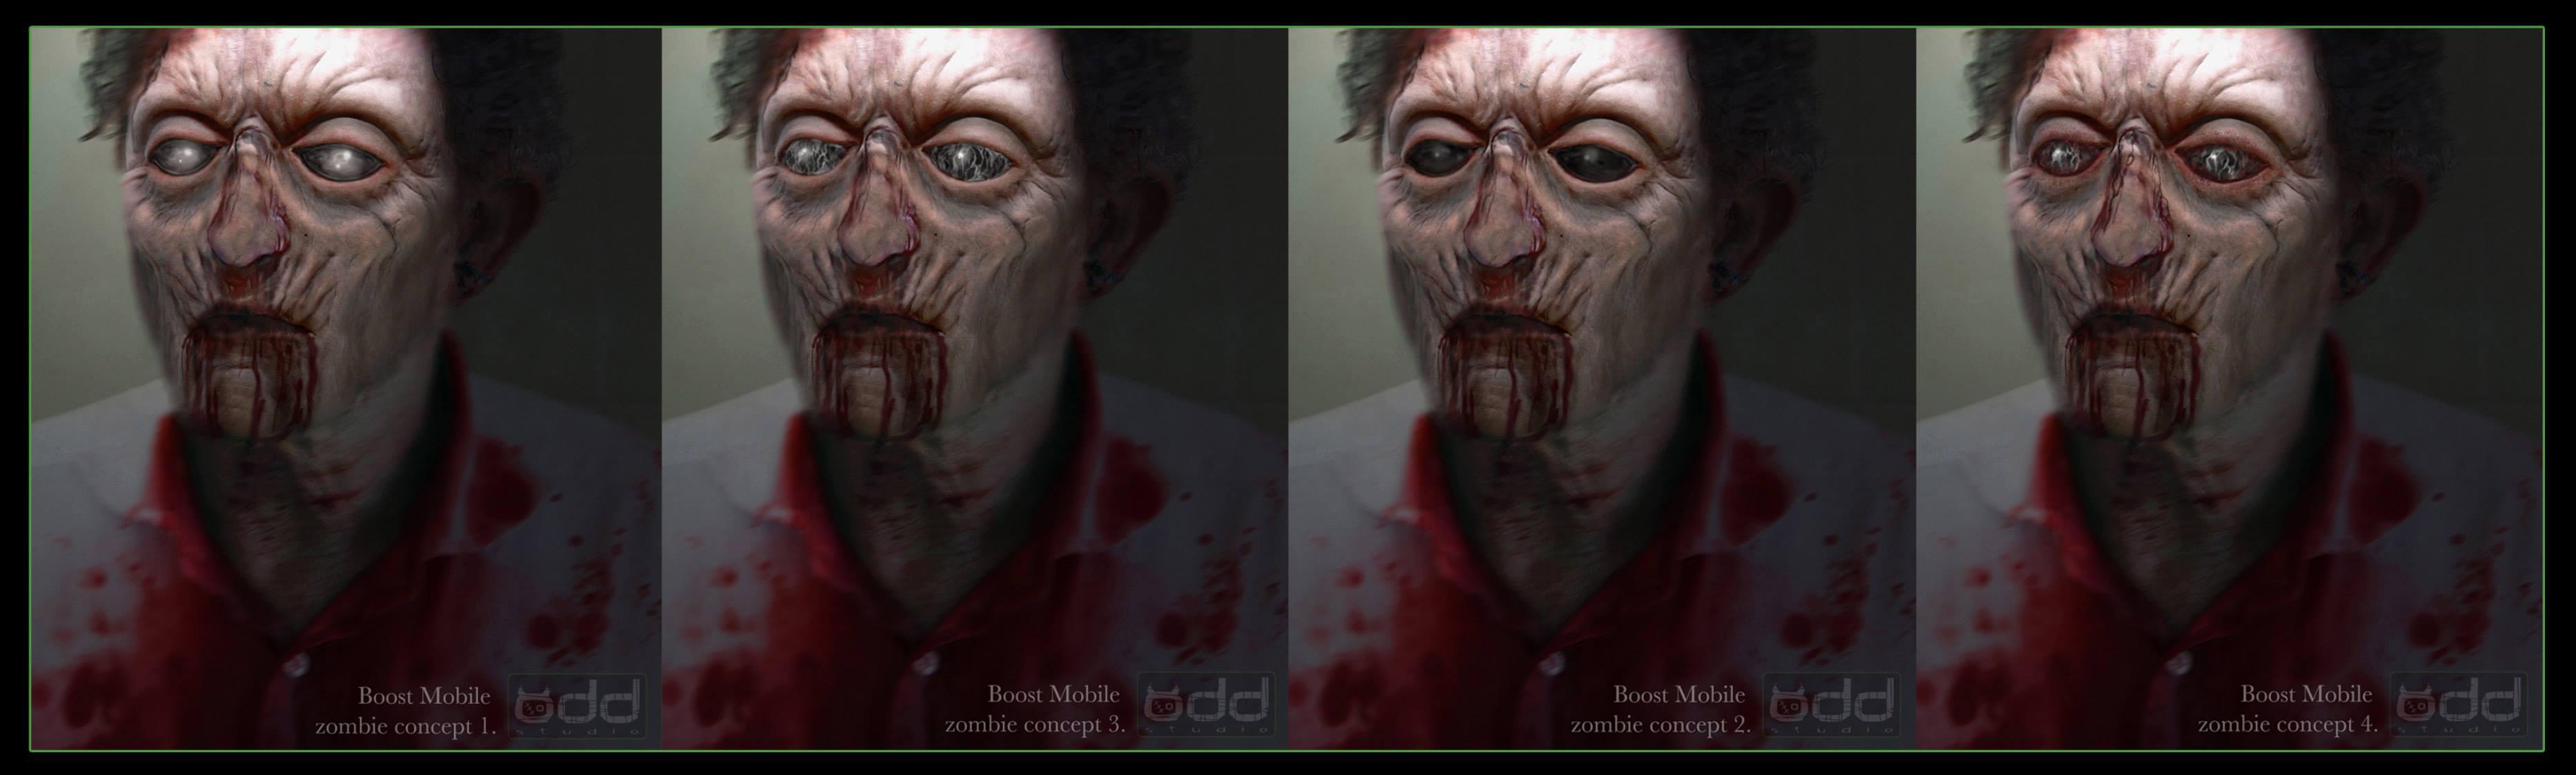 Boost Mobile Zombie girl concept. Design by Adam Johansen.